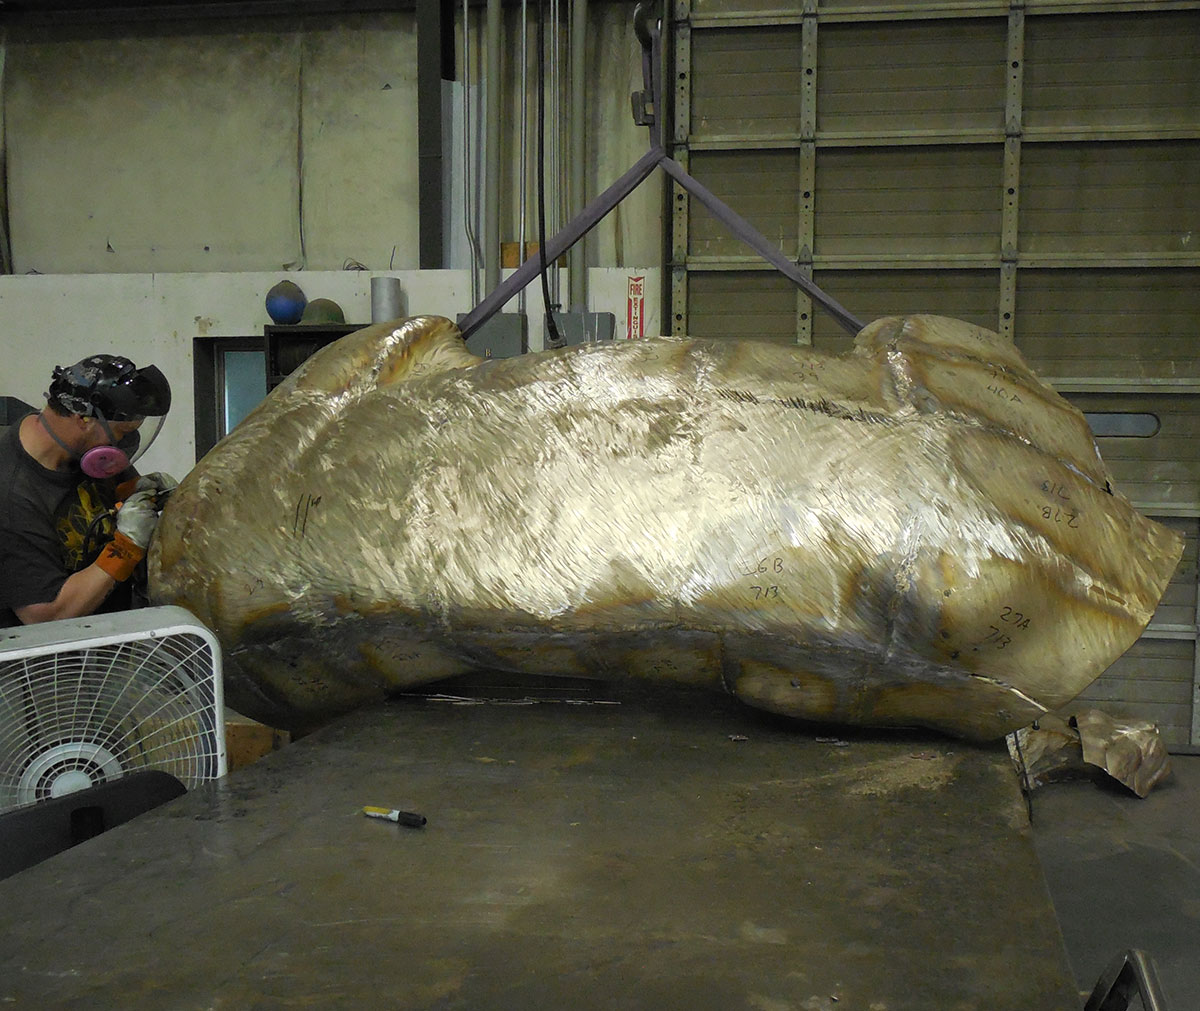 JWU University Wildcat Mascot Lost Wax Investment Casting Bobcat Monument 10